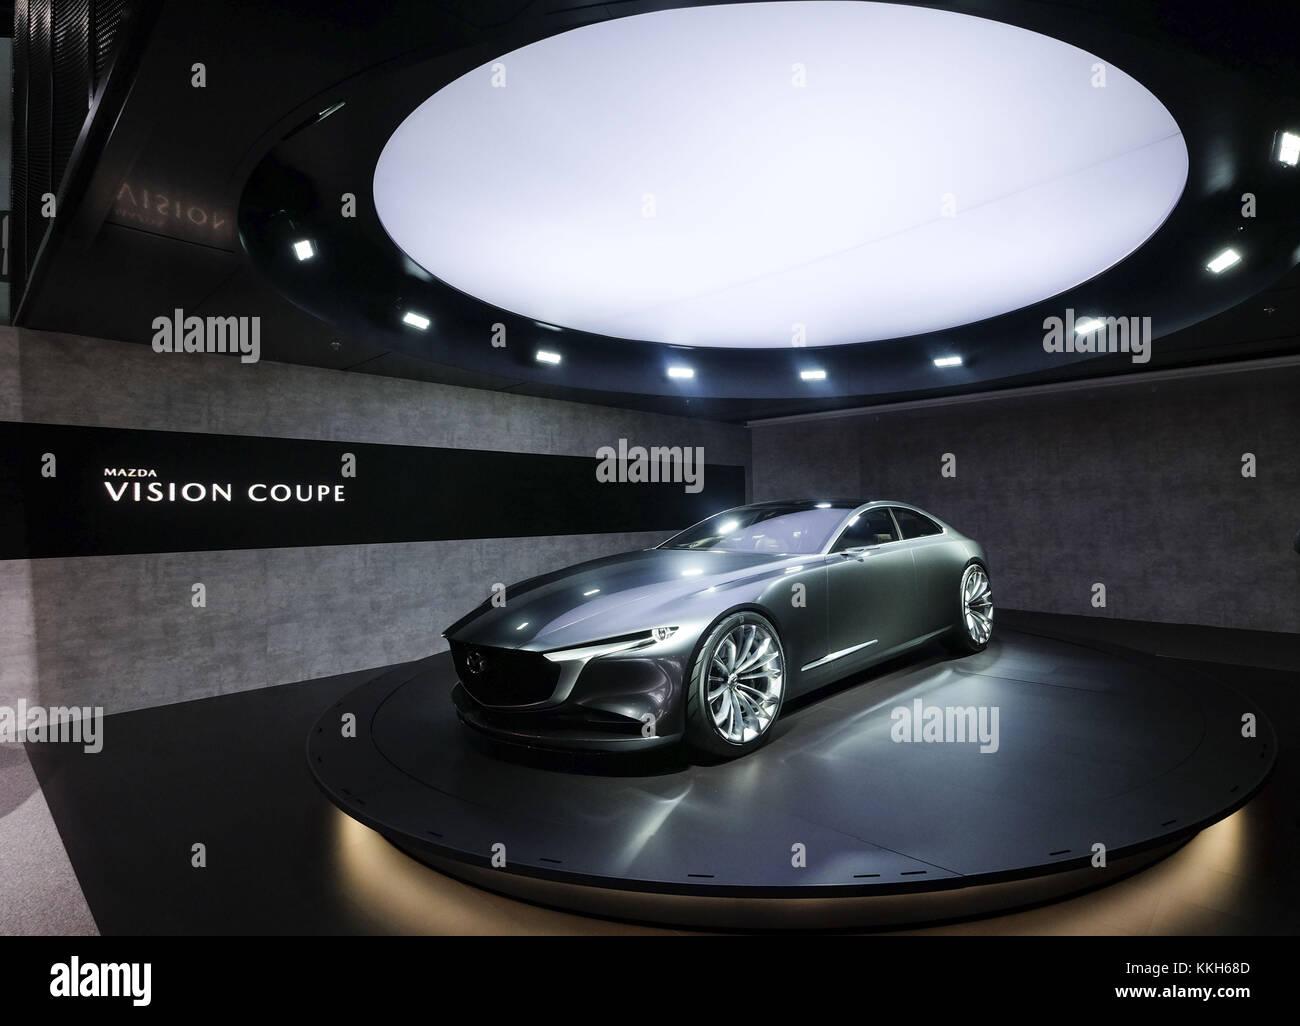 https://c8.alamy.com/comp/KKH68D/los-angeles-california-usa-30th-nov-2017-the-mazda-vision-coupe-concept-KKH68D.jpg